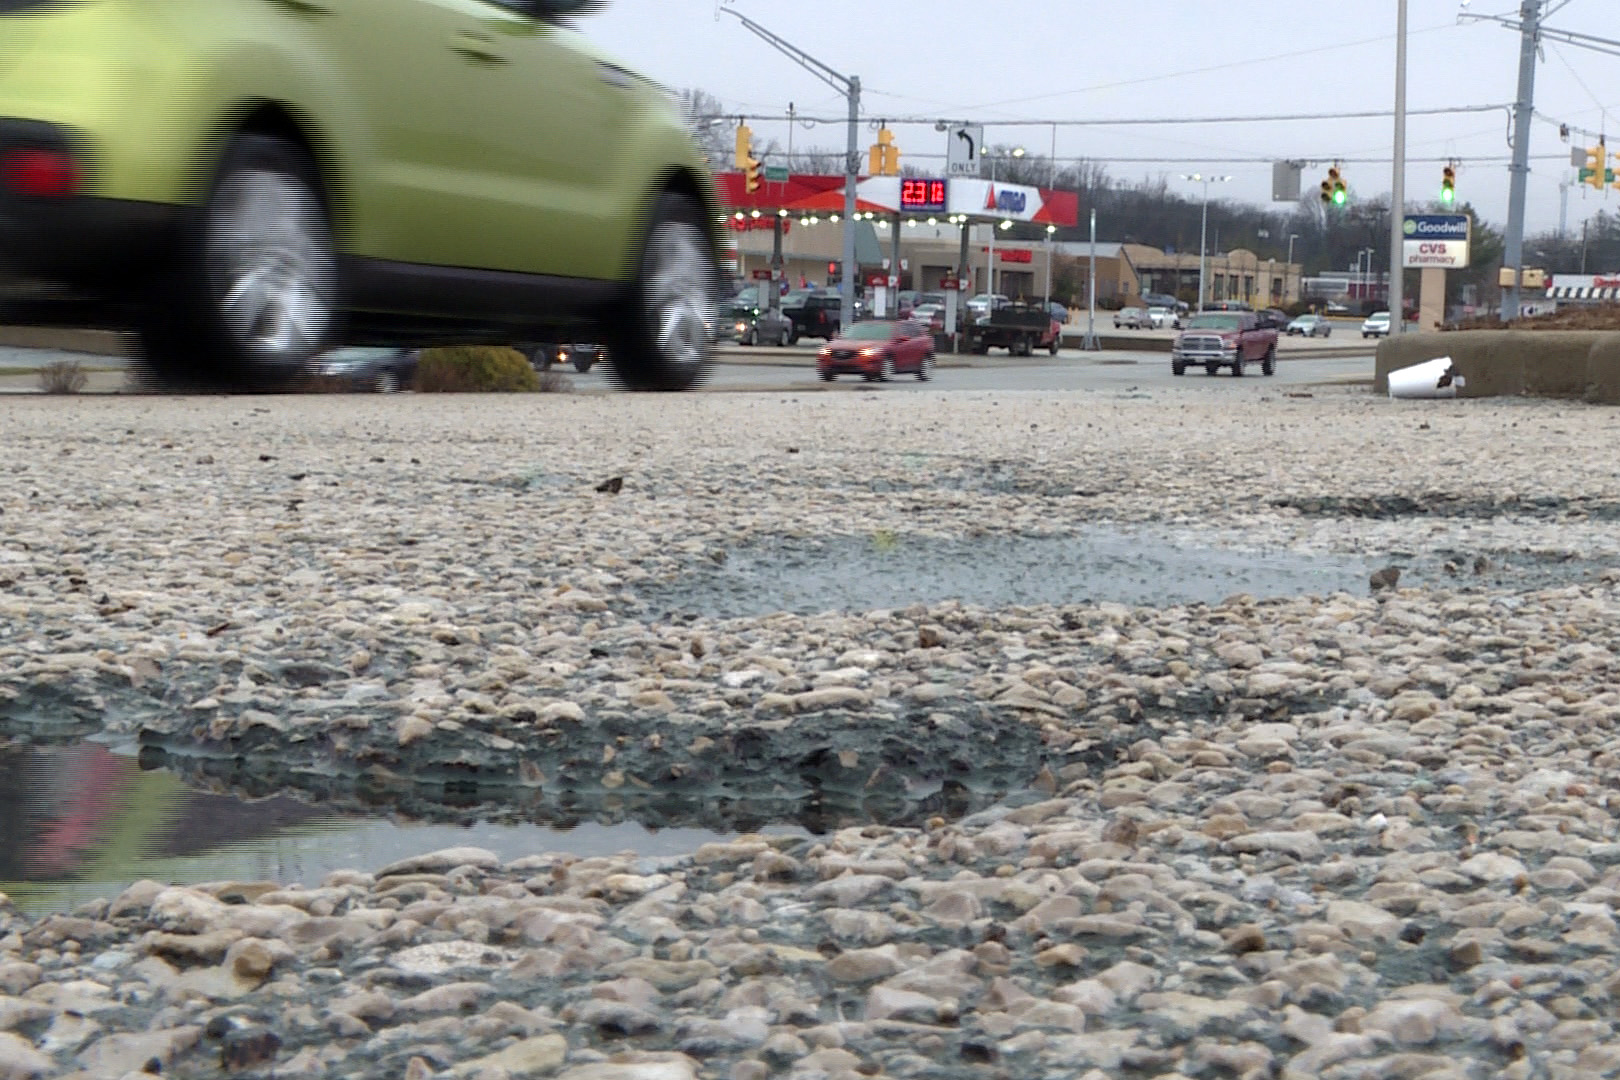 Potholes in Bloomington